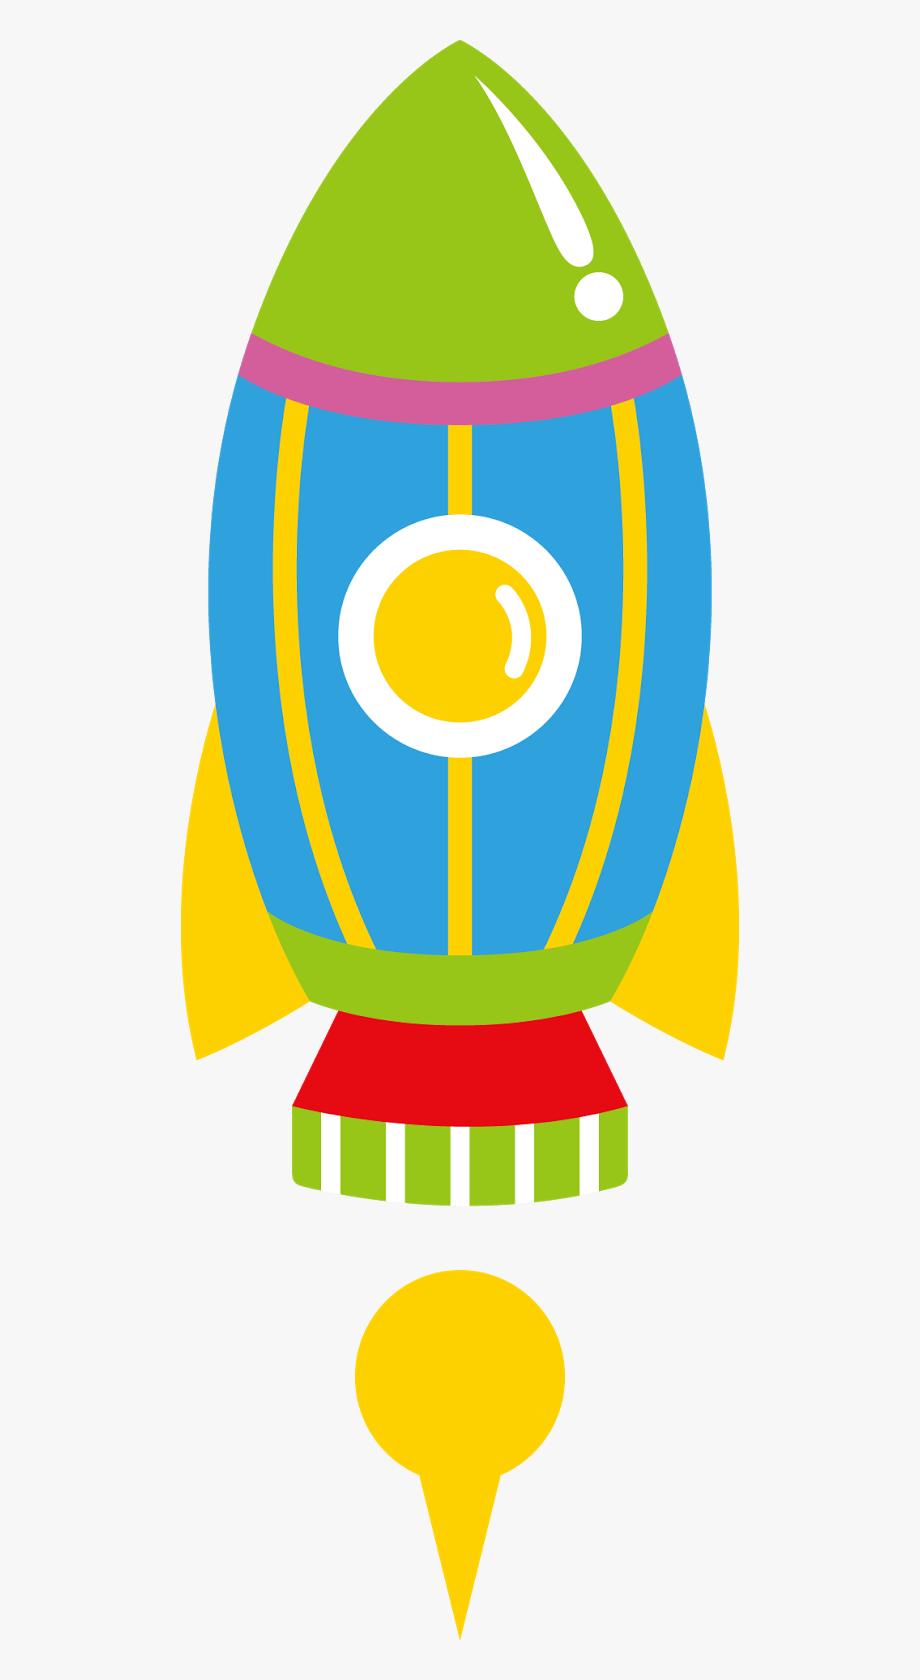 Spaceship clipart buzz lightyear spaceship. Picture stock aliens astronauts